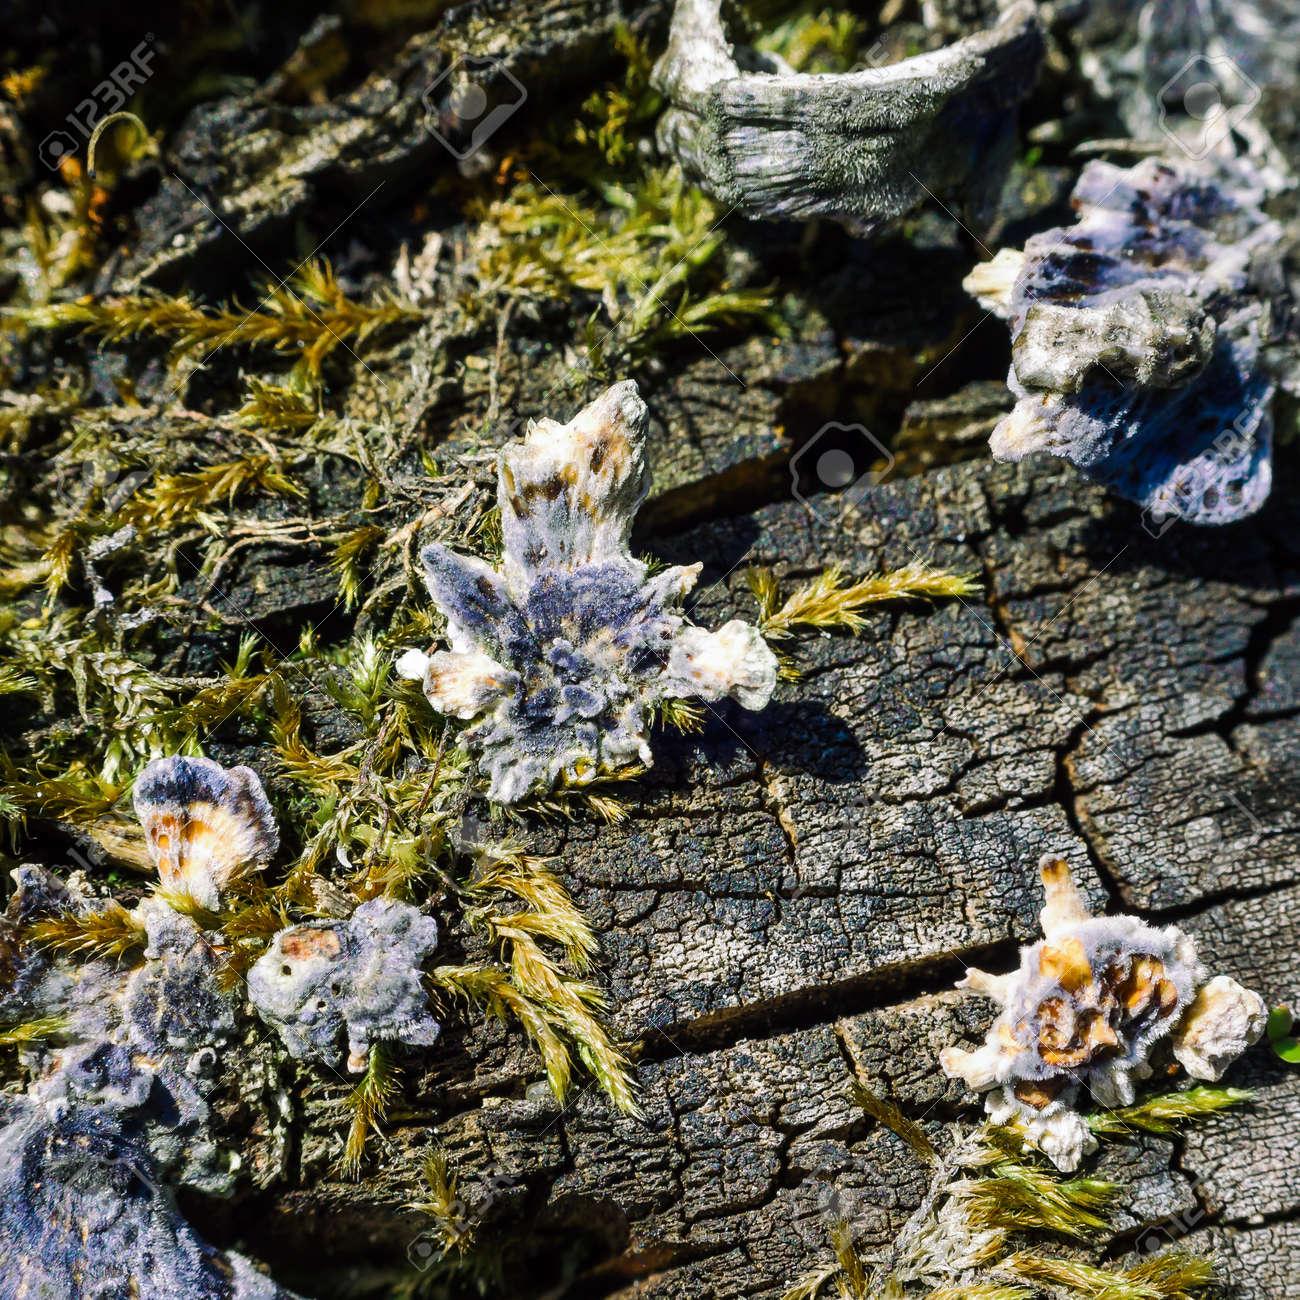 HUBS - Mushrooms on a dead tree trunk - 169541044